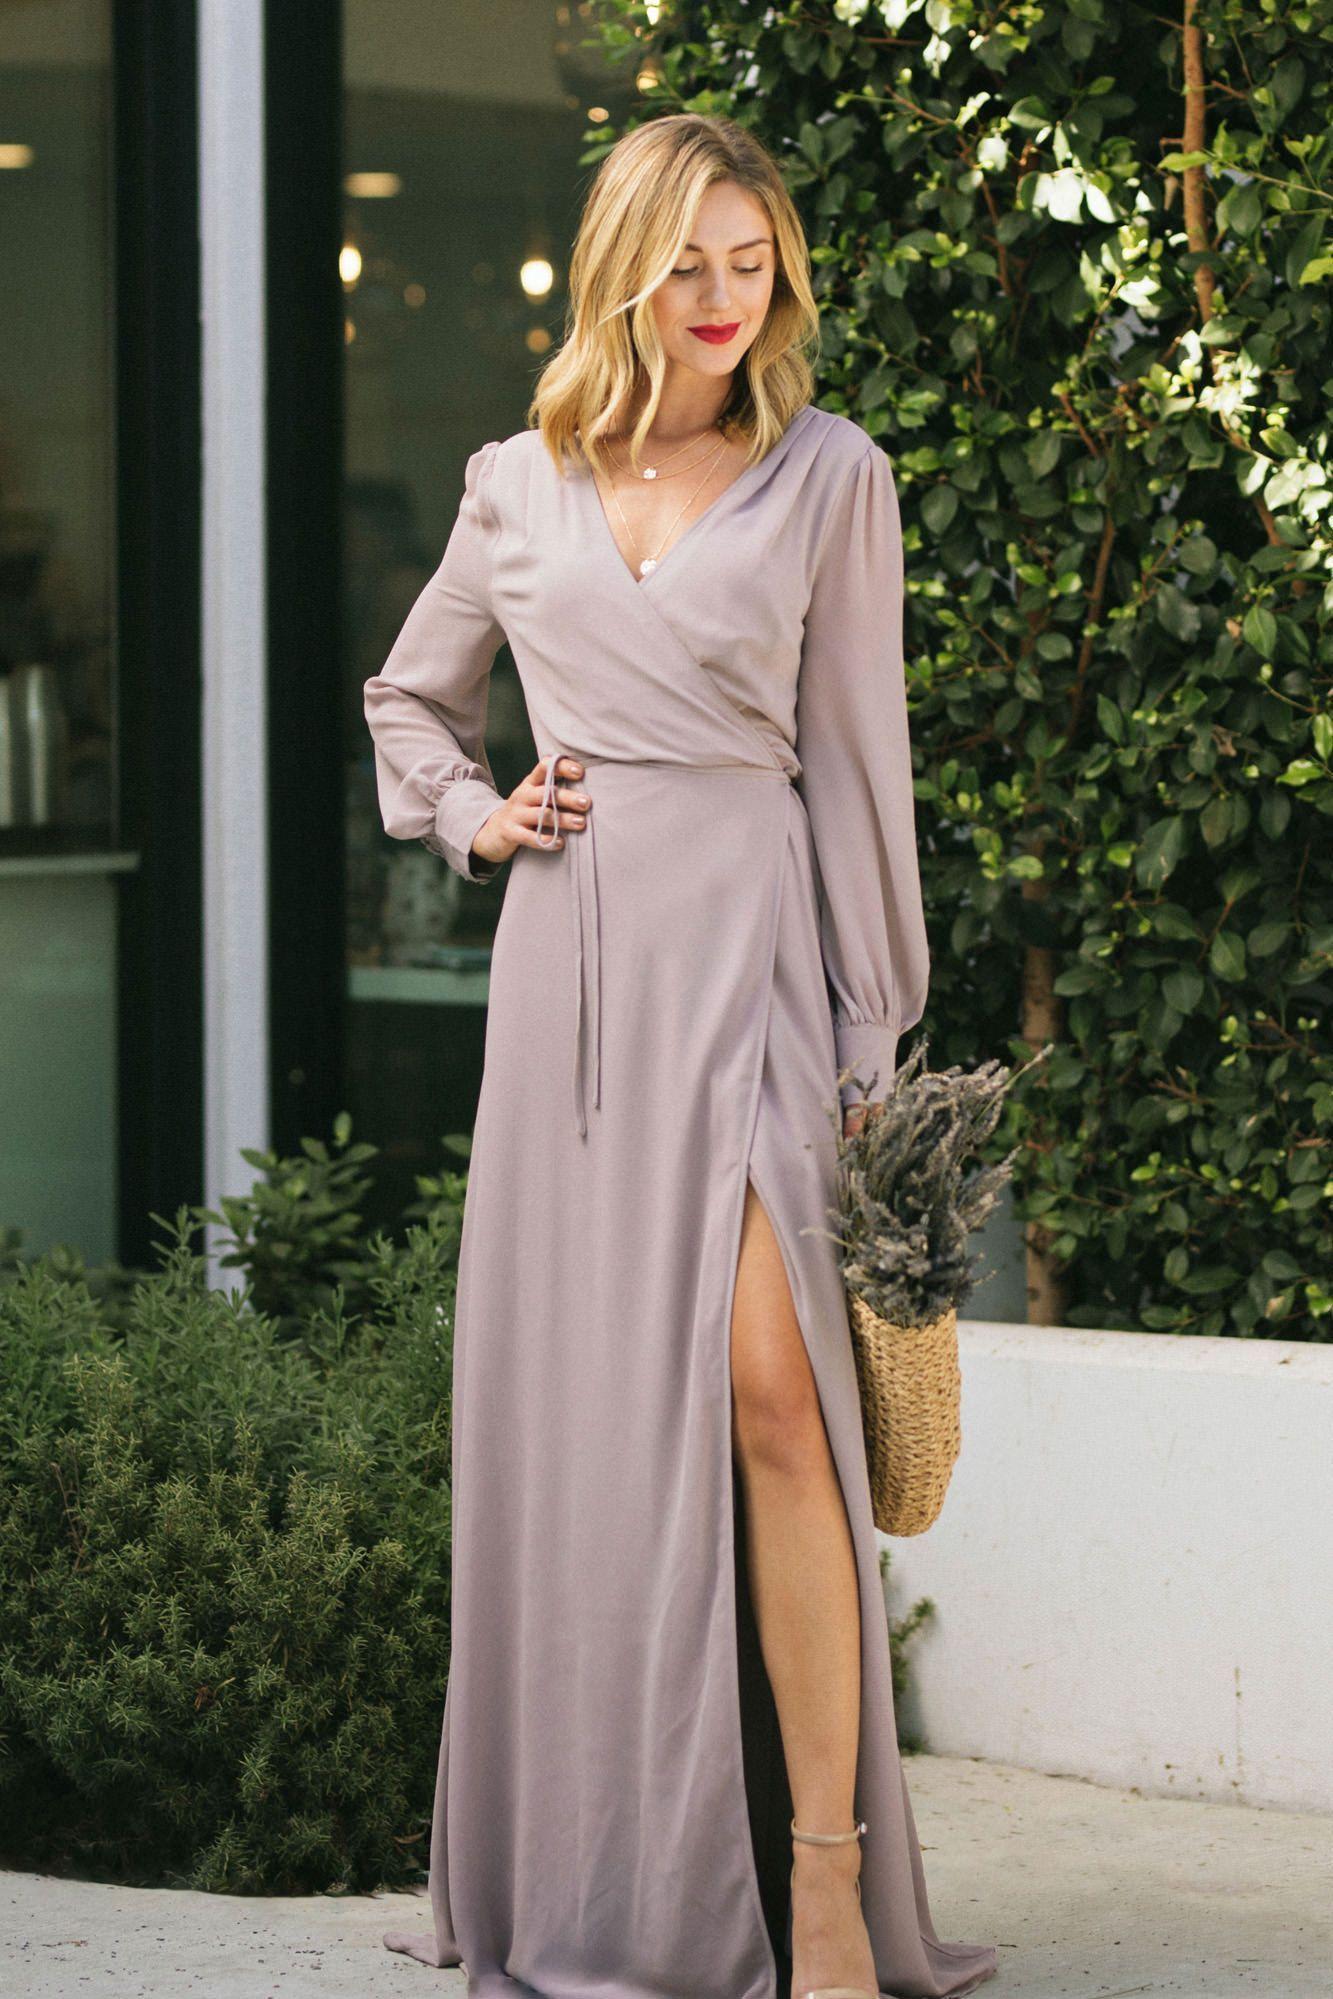 Chloe Long Sleeve Wrap Maxi Dress Mauve Large In 2021 Maxi Wrap Dress Cute Maxi Dress Long Sleeve Bridesmaid Dress [ 1999 x 1333 Pixel ]